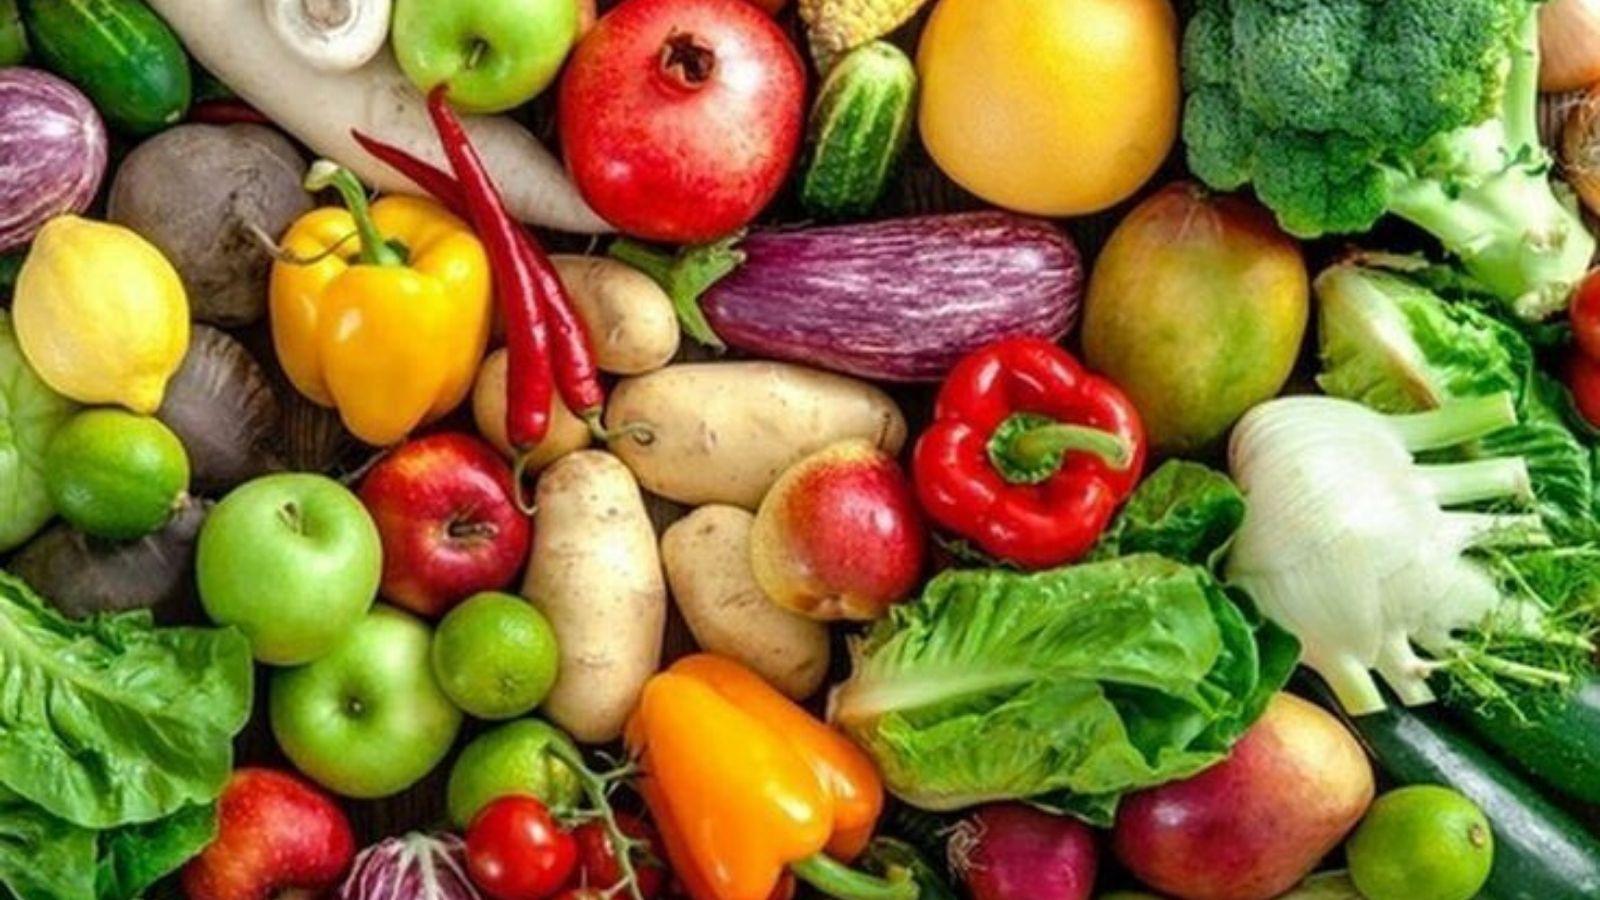 cleaning veggies